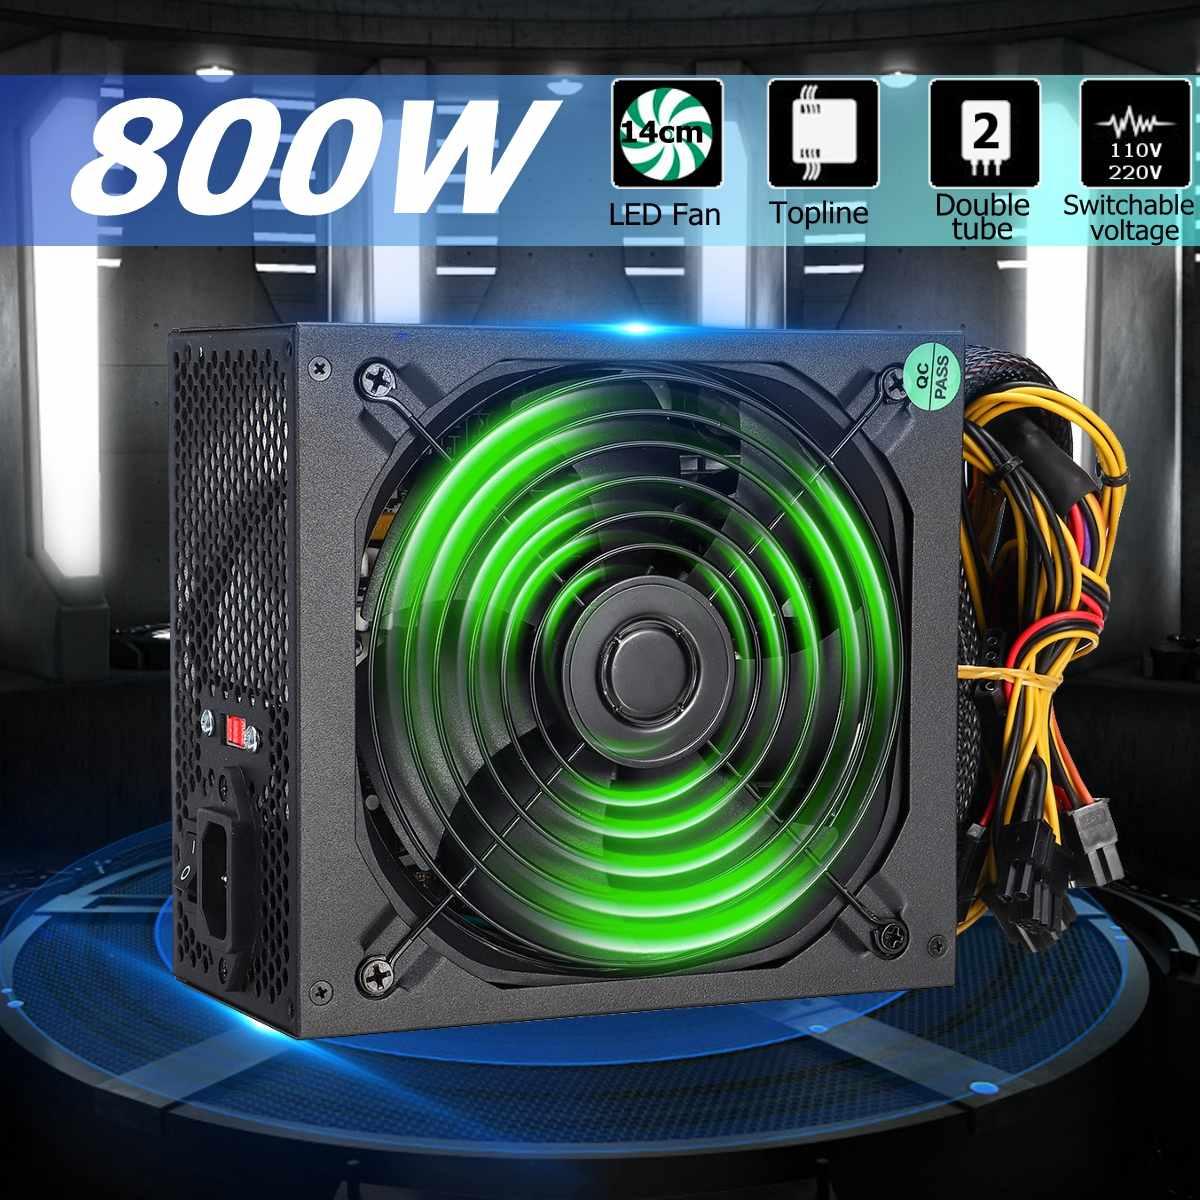 800W Power Supply 140mm LED Fan 24 Pin PCI SATA ATX 12V Computer Power Supply800W Power Supply 140mm LED Fan 24 Pin PCI SATA ATX 12V Computer Power Supply